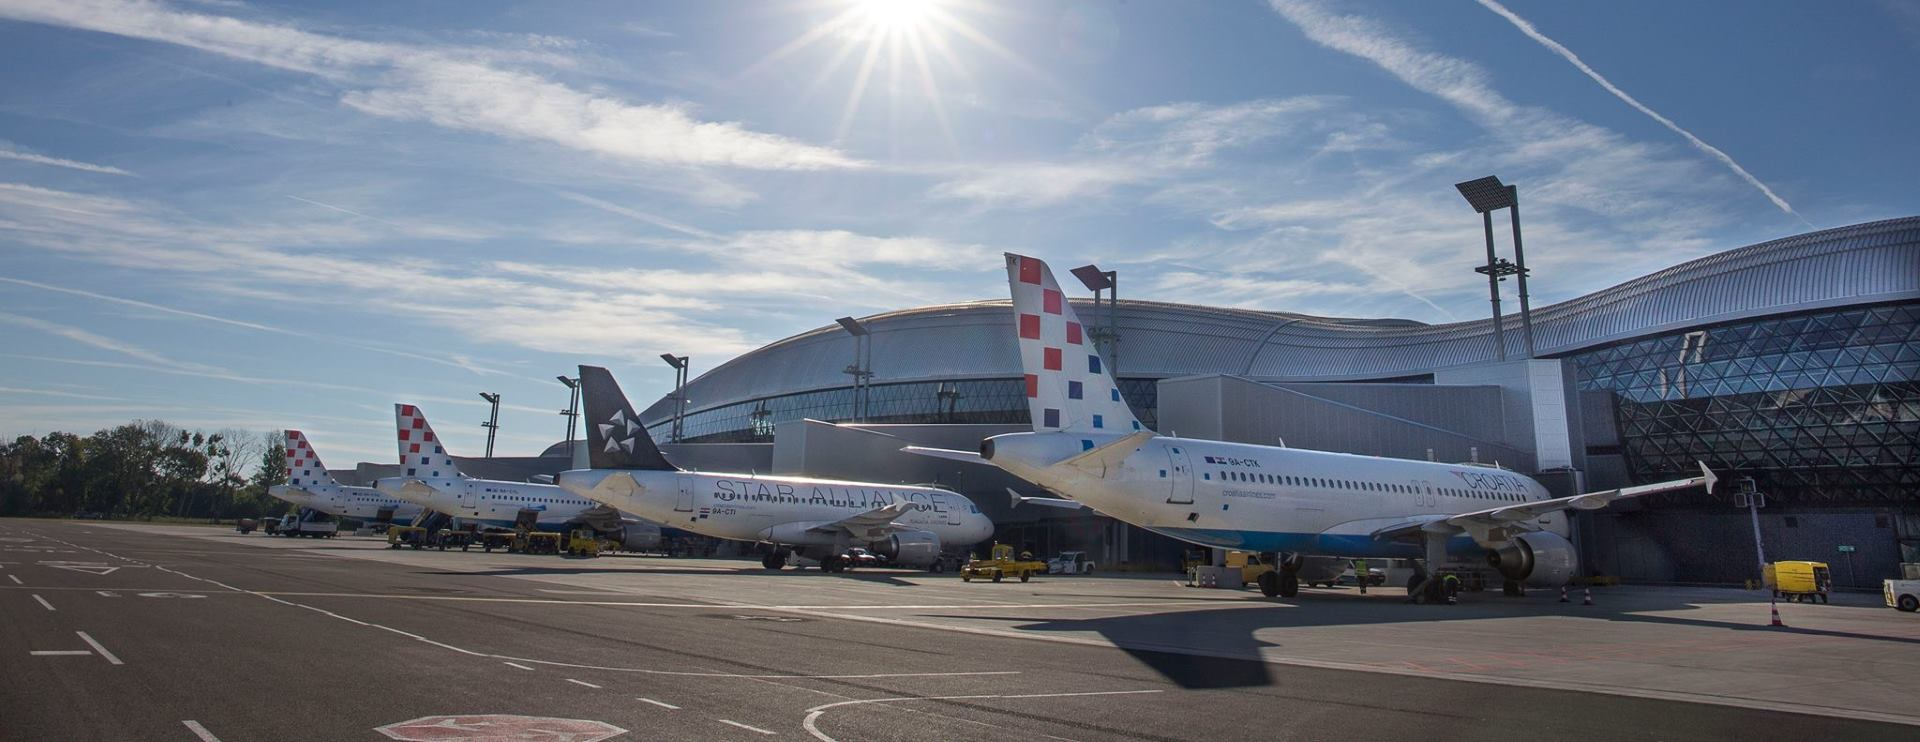 Croatia Airlines vas poziva u poznate europske metropole